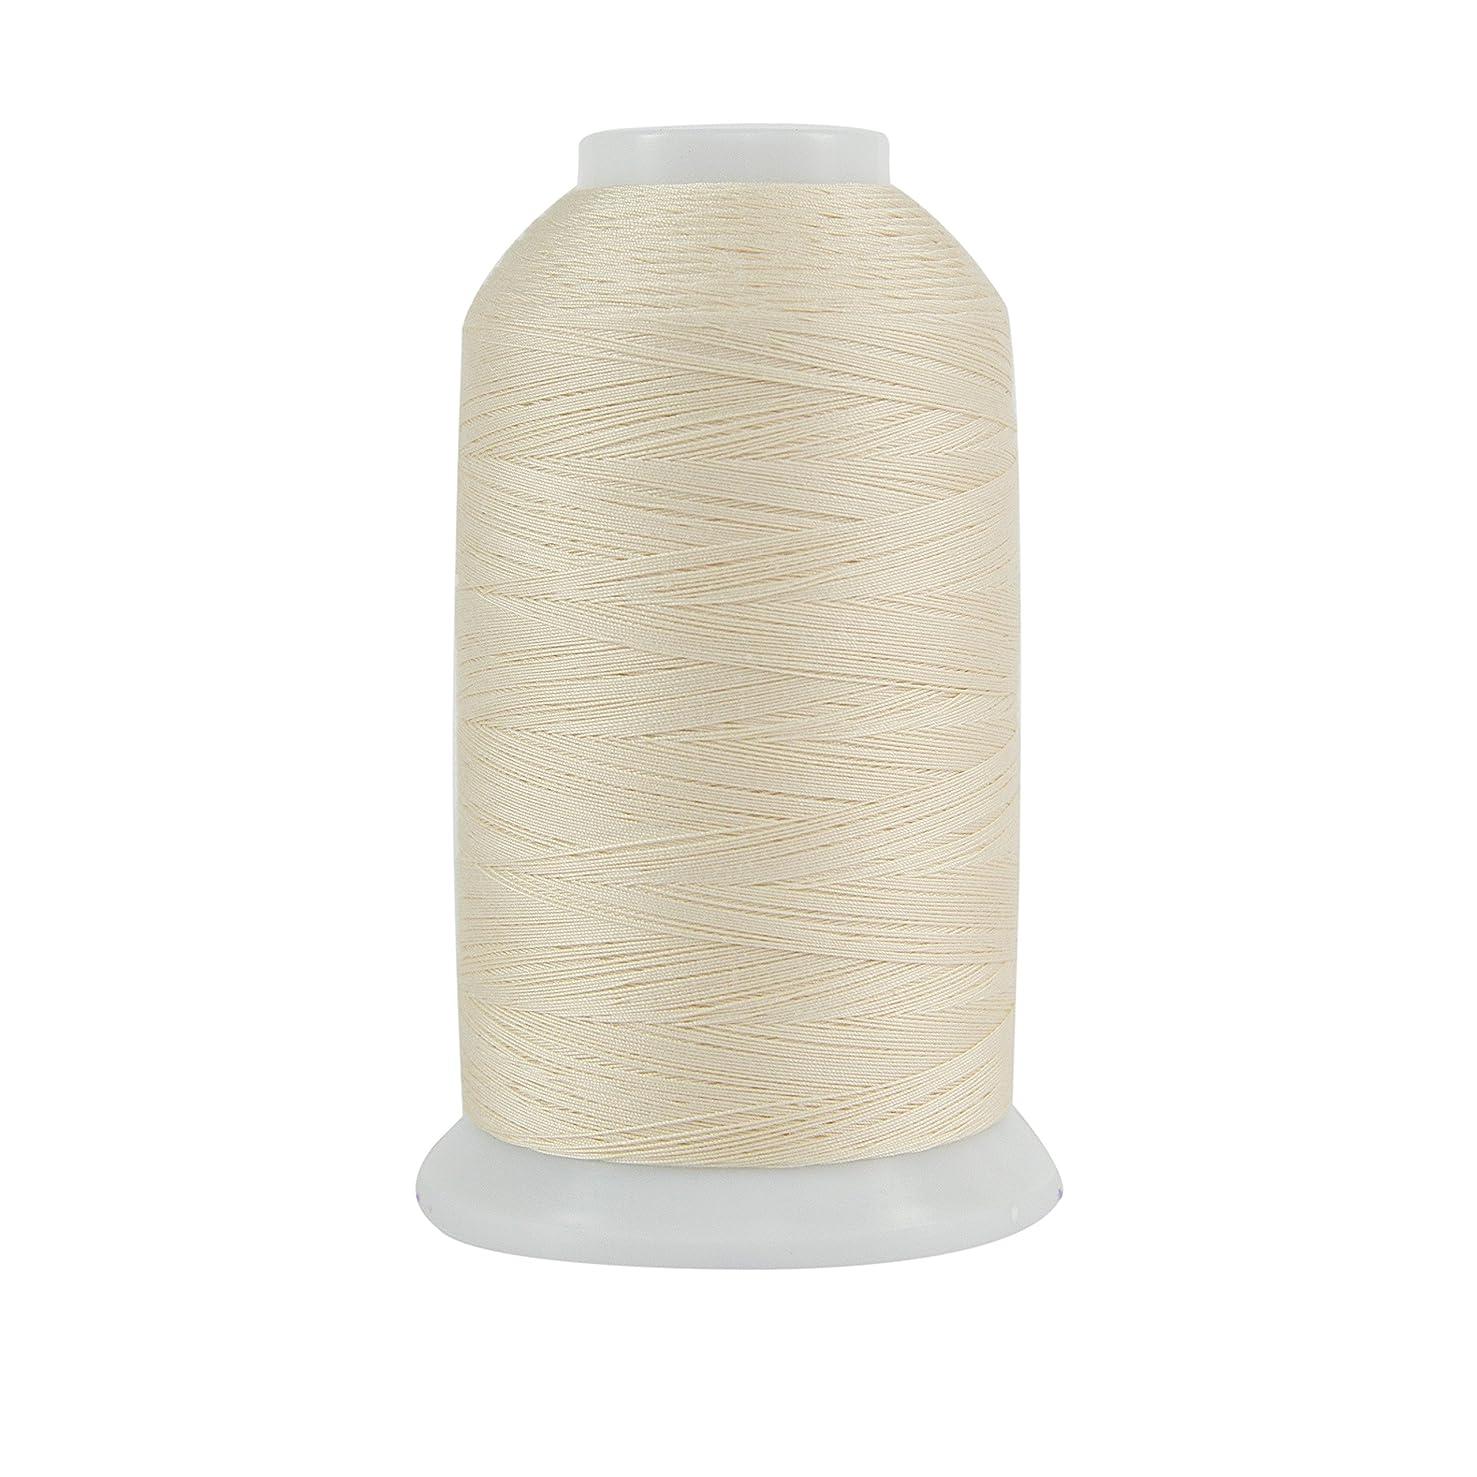 Superior Threads 121029XX972 Papyrus 3-Ply 40W King TUT Cotton Quilting Thread, 2000 yd